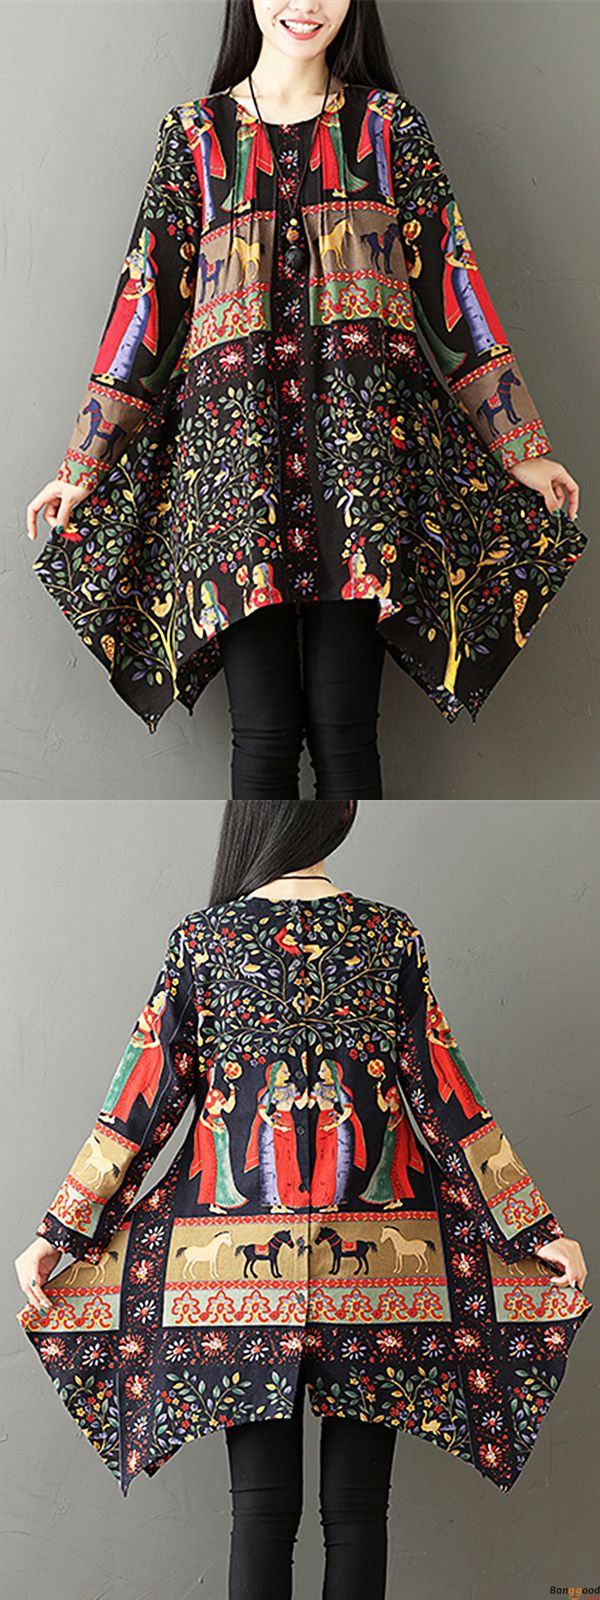 US$25.99 + Free shipping. Size: M~5XL. Color: Black, Blue,  Loving this vintage style. Gracila Ethnic Women Printed O-neck Irregular Blouses. #women #blouses#2018